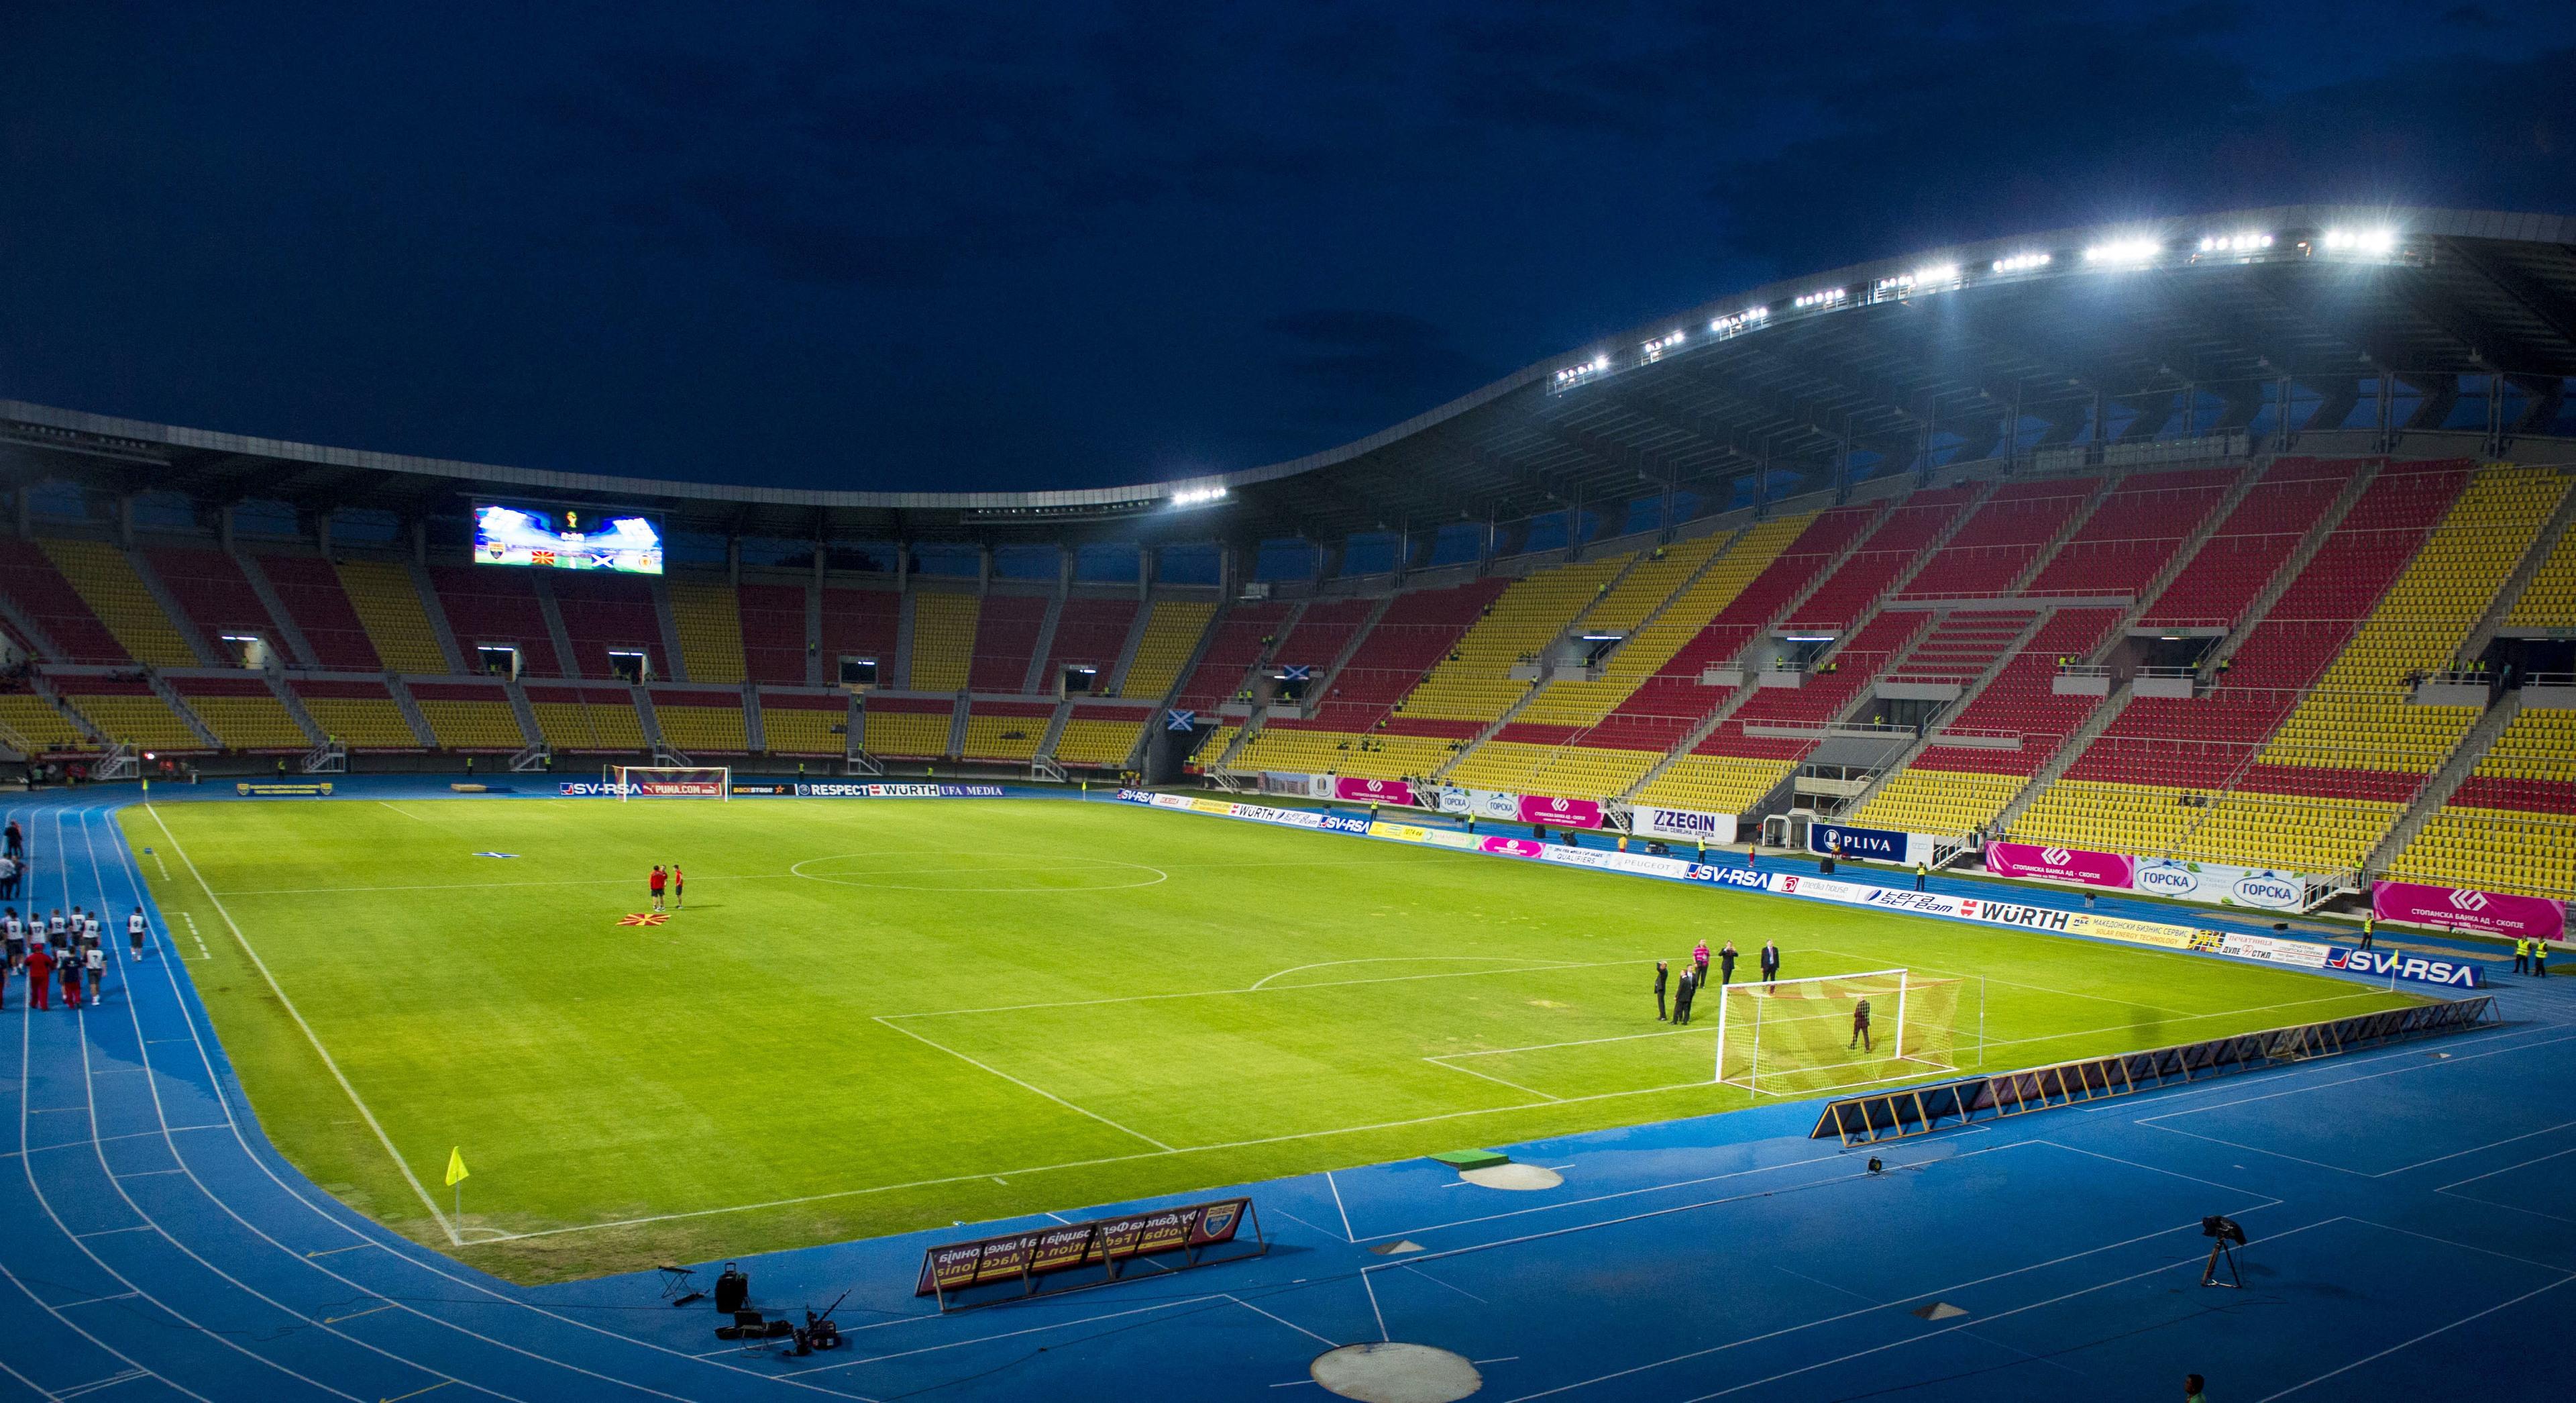 Philip II Arena - home of the Macedonia international team